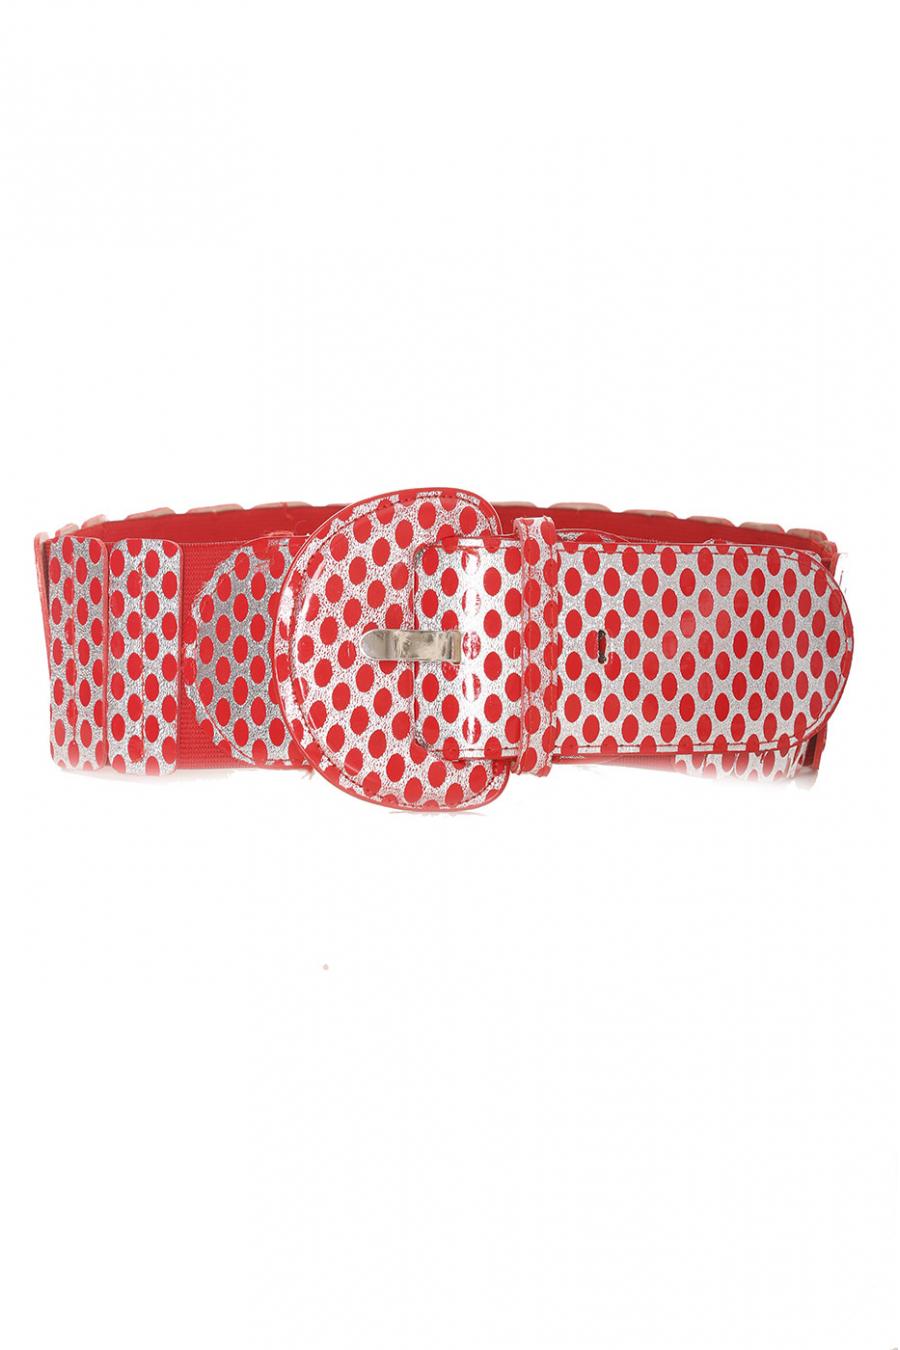 Red elastic waistband with print - BG - P045